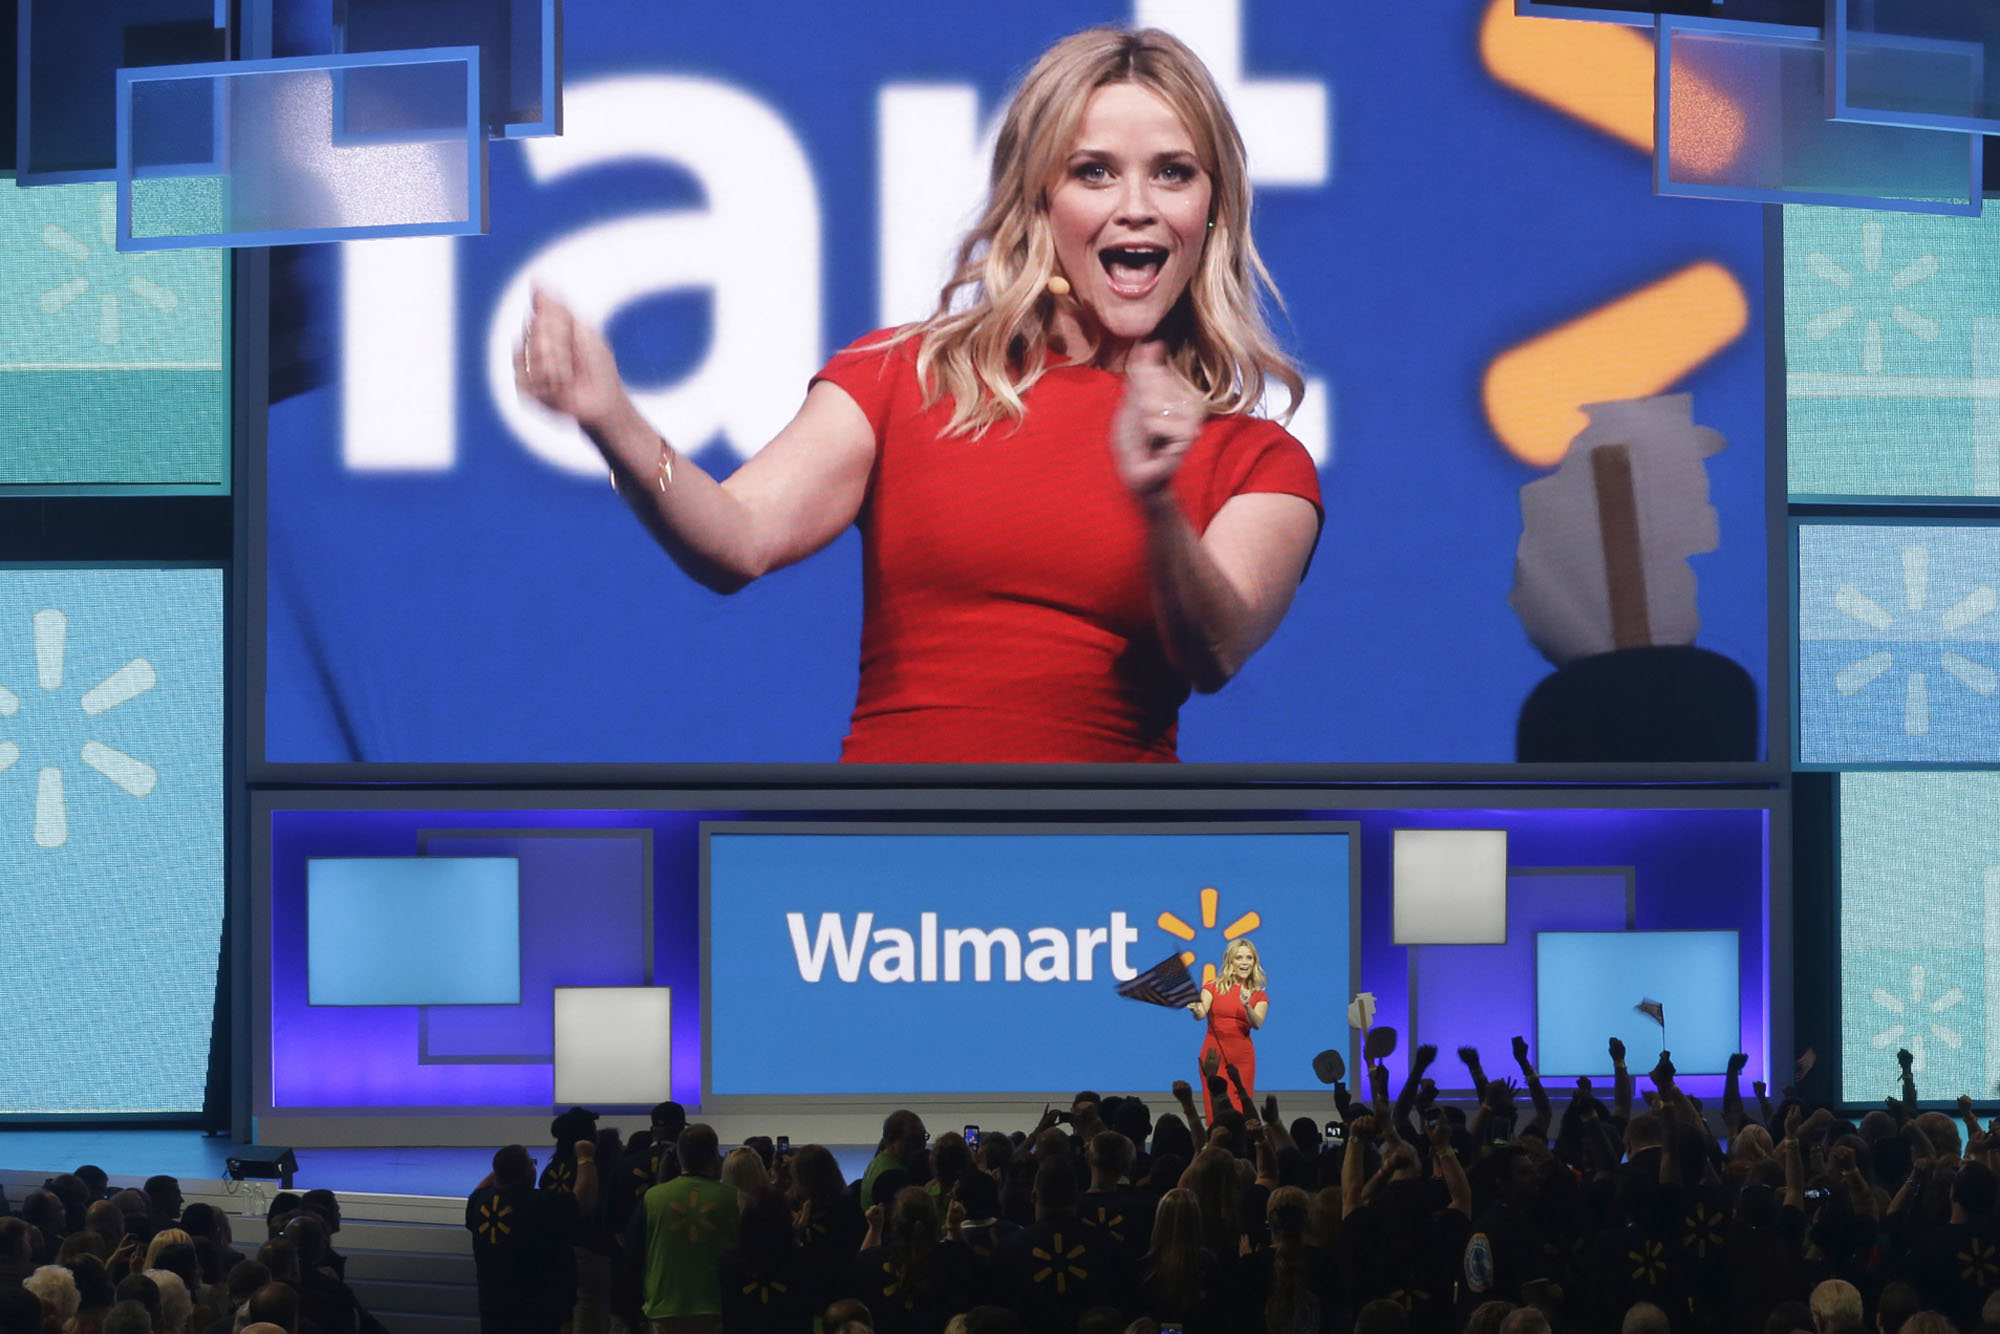 Reese at Walmart.jpg